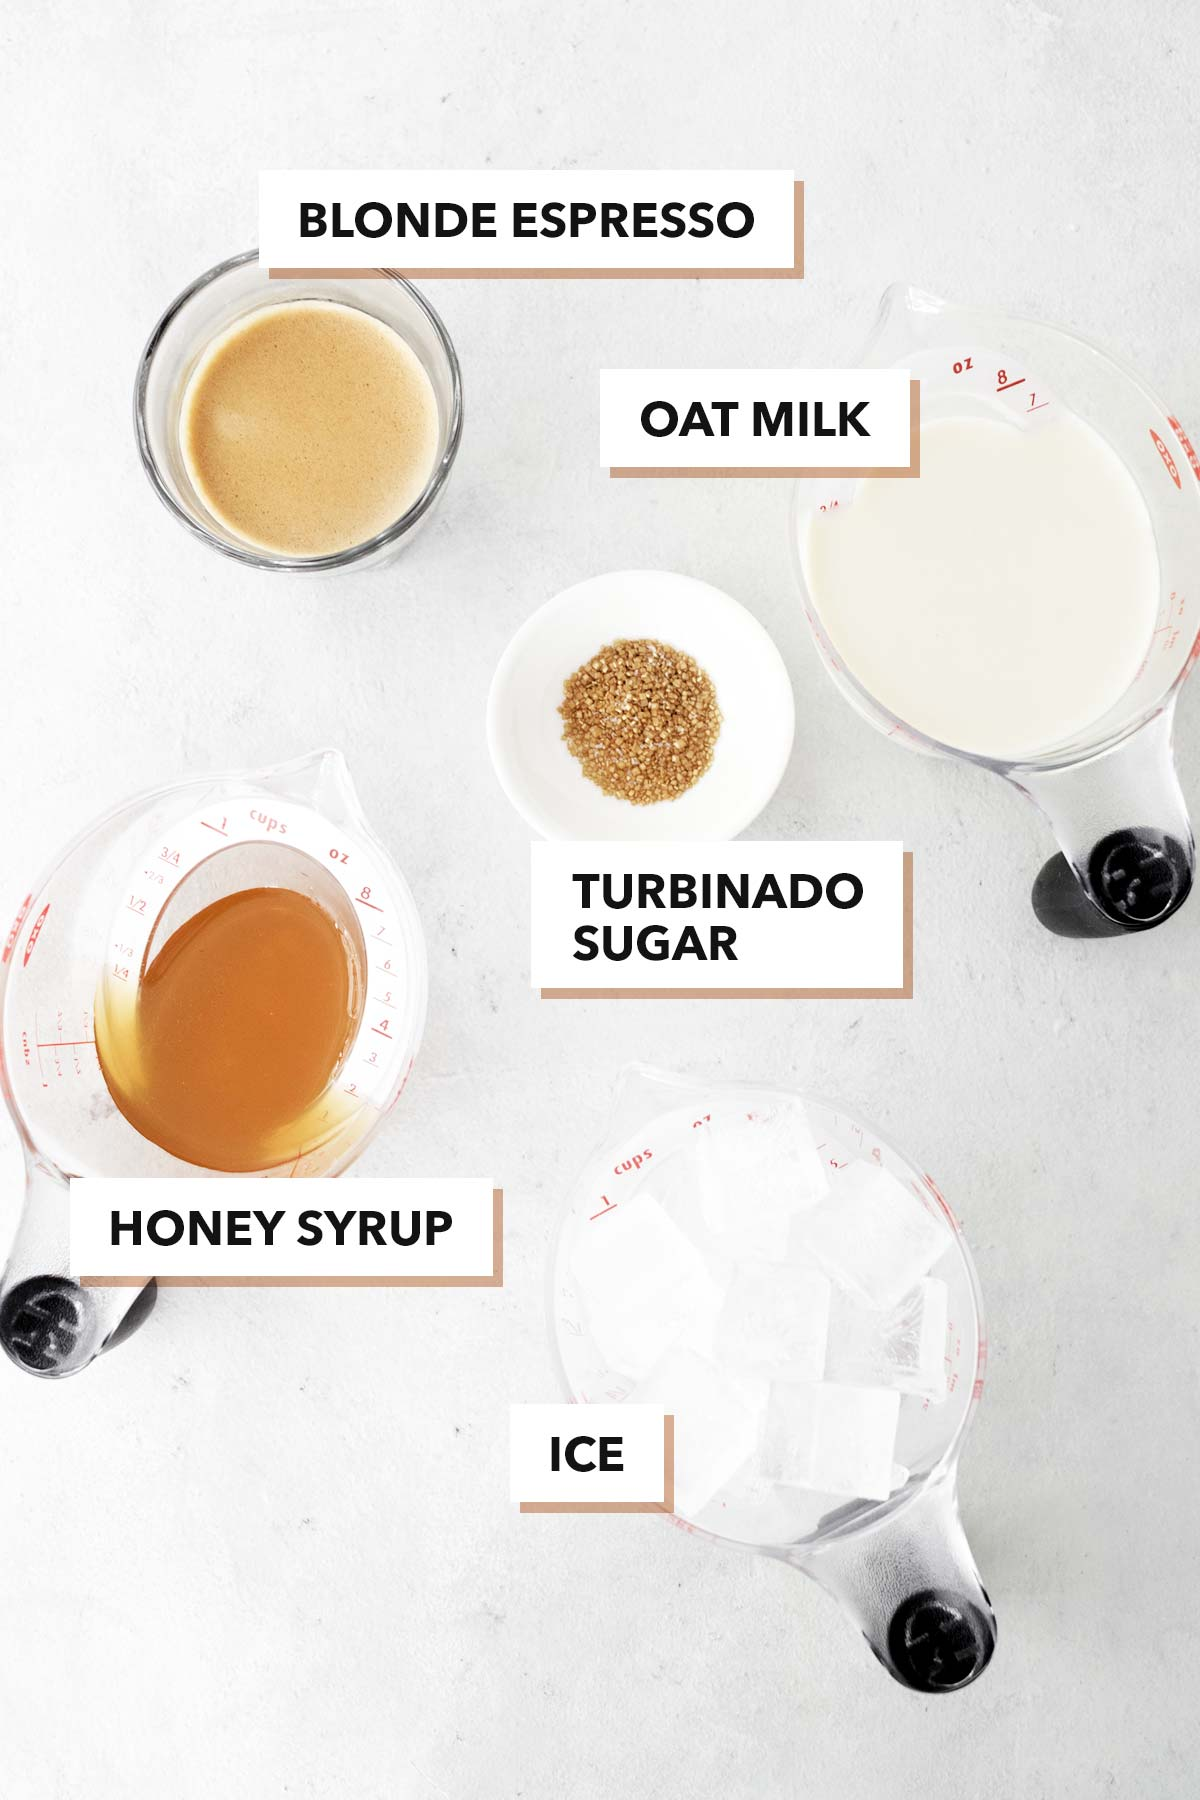 Starbucks Iced Honey Oatmilk Latte copycat drink ingredients.